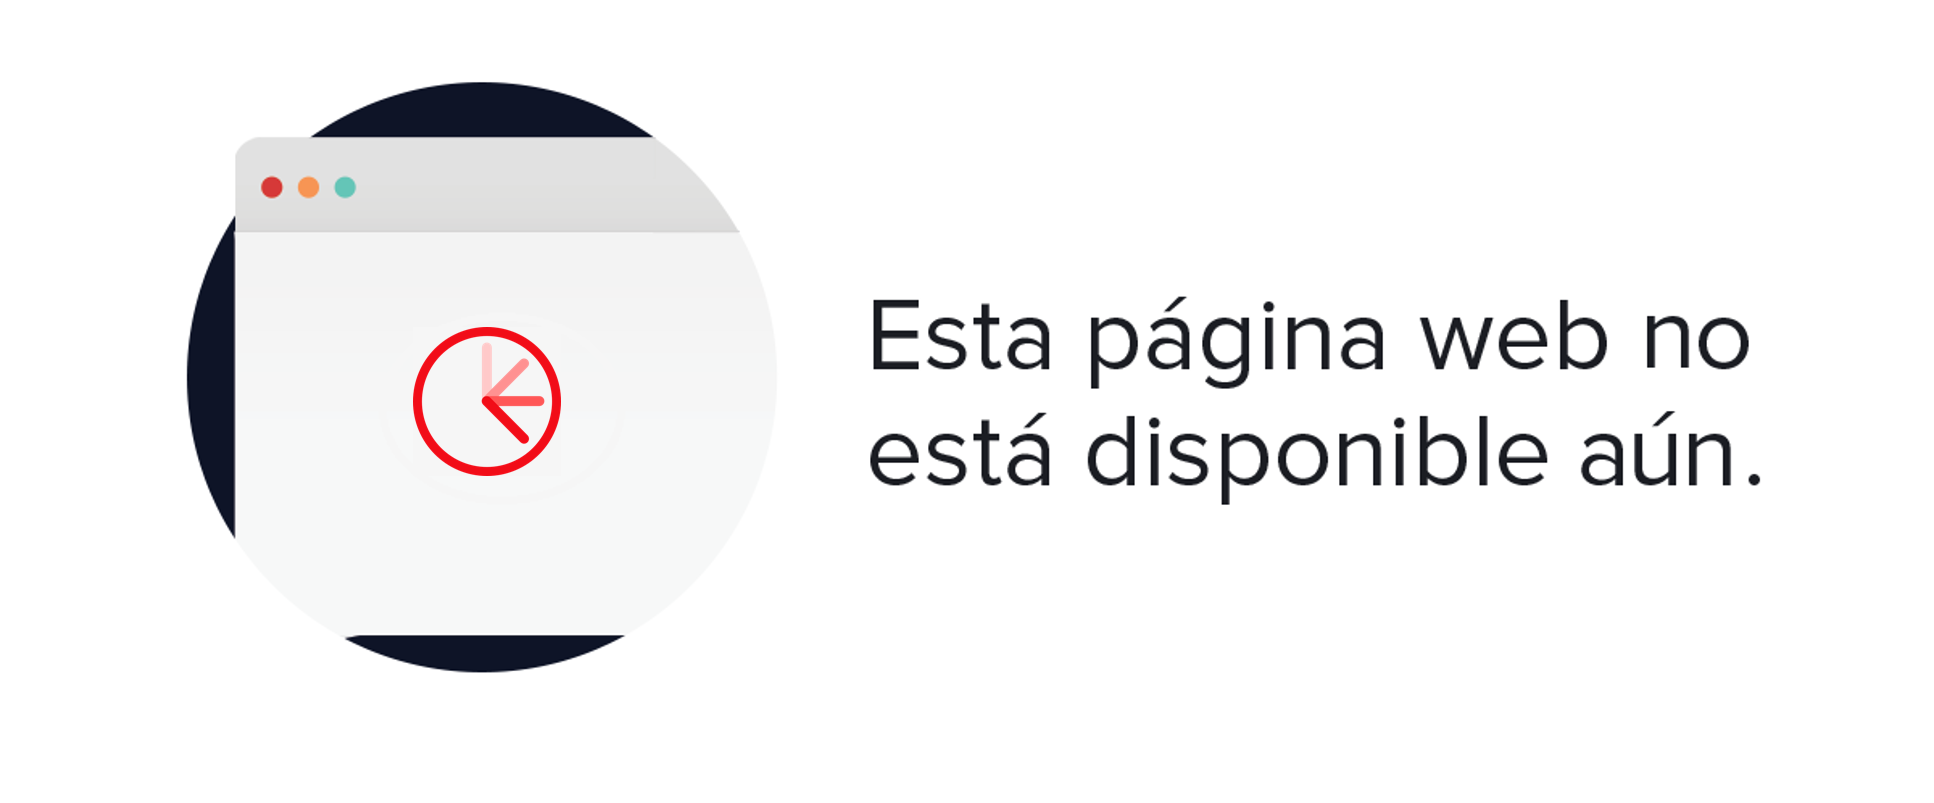 Tods Azul Zapatillas Deportivas Hombre 472635 - Barato - HNLQFIP